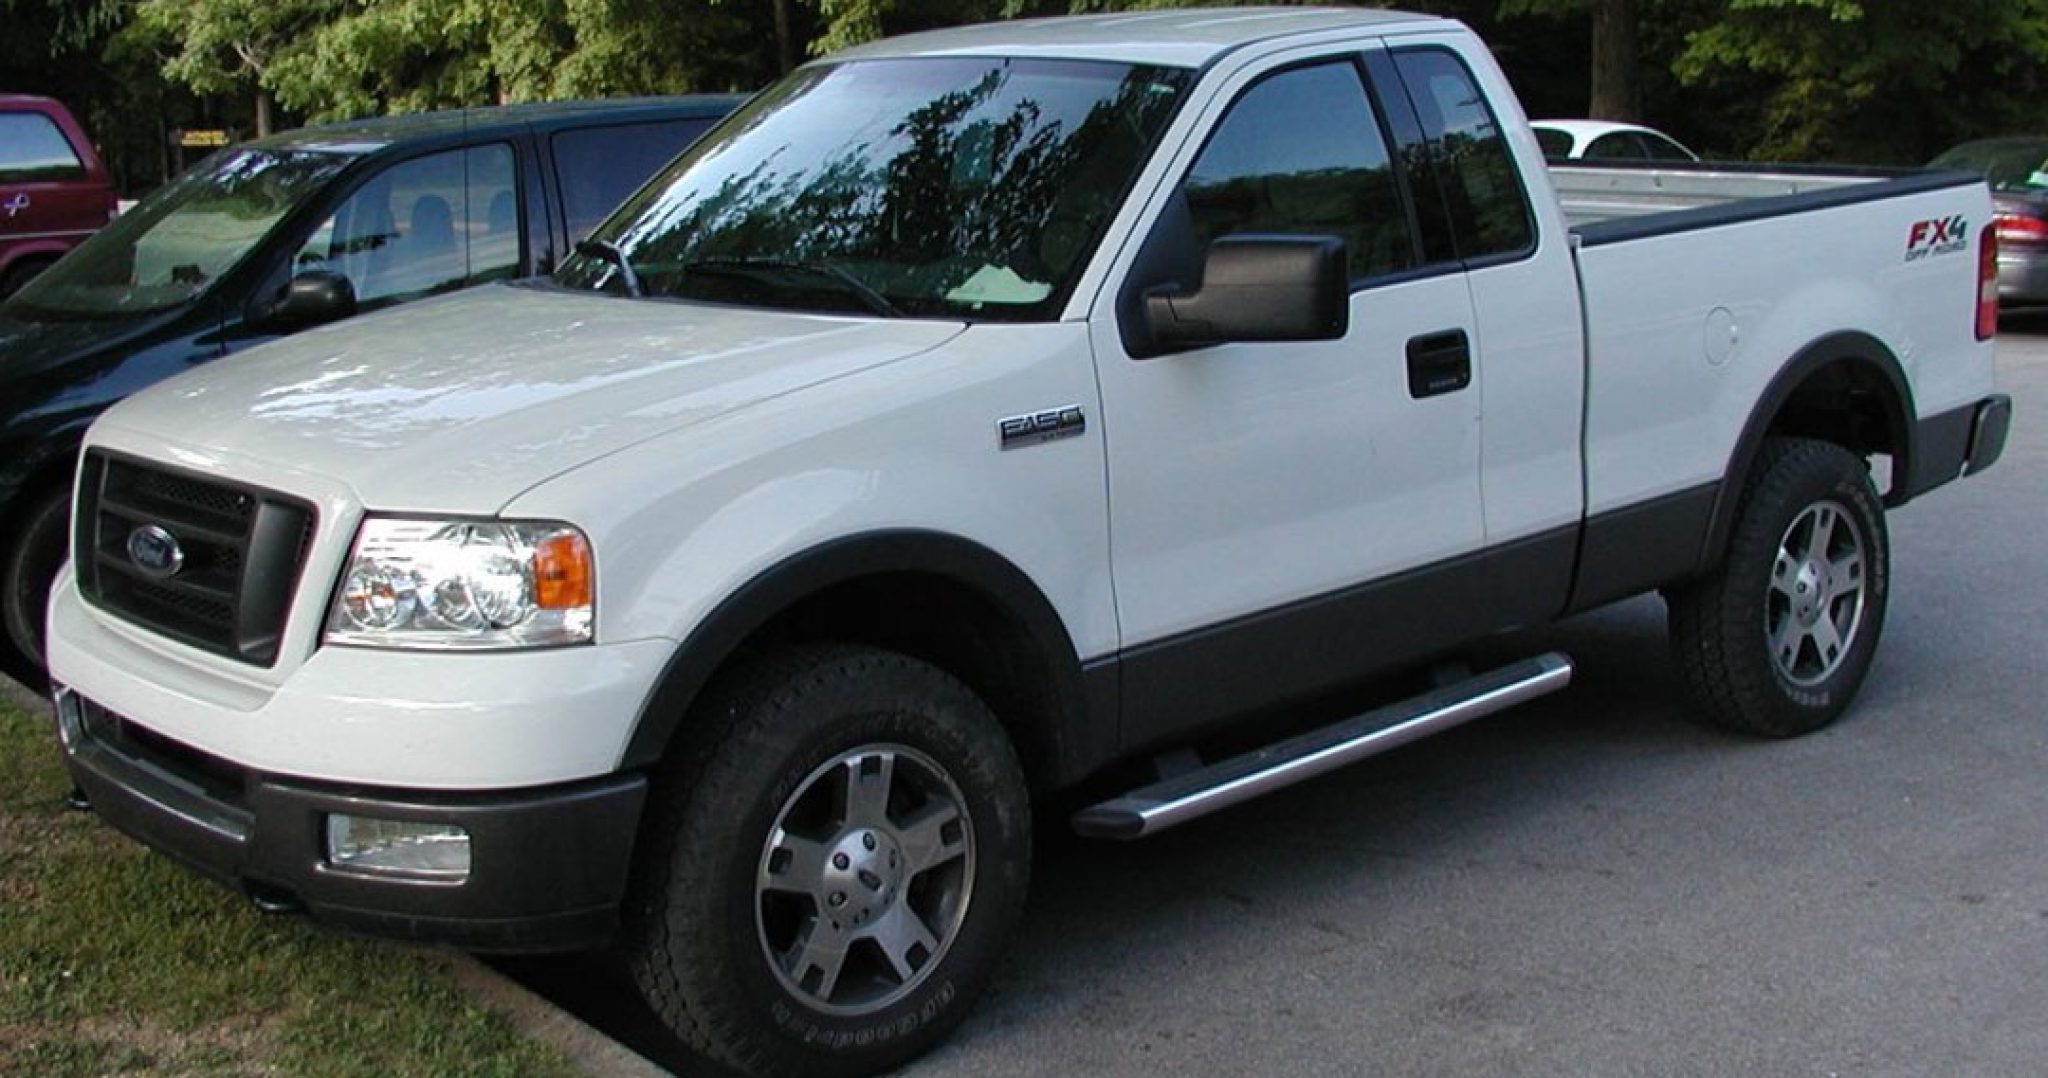 Ford F-Series Truck